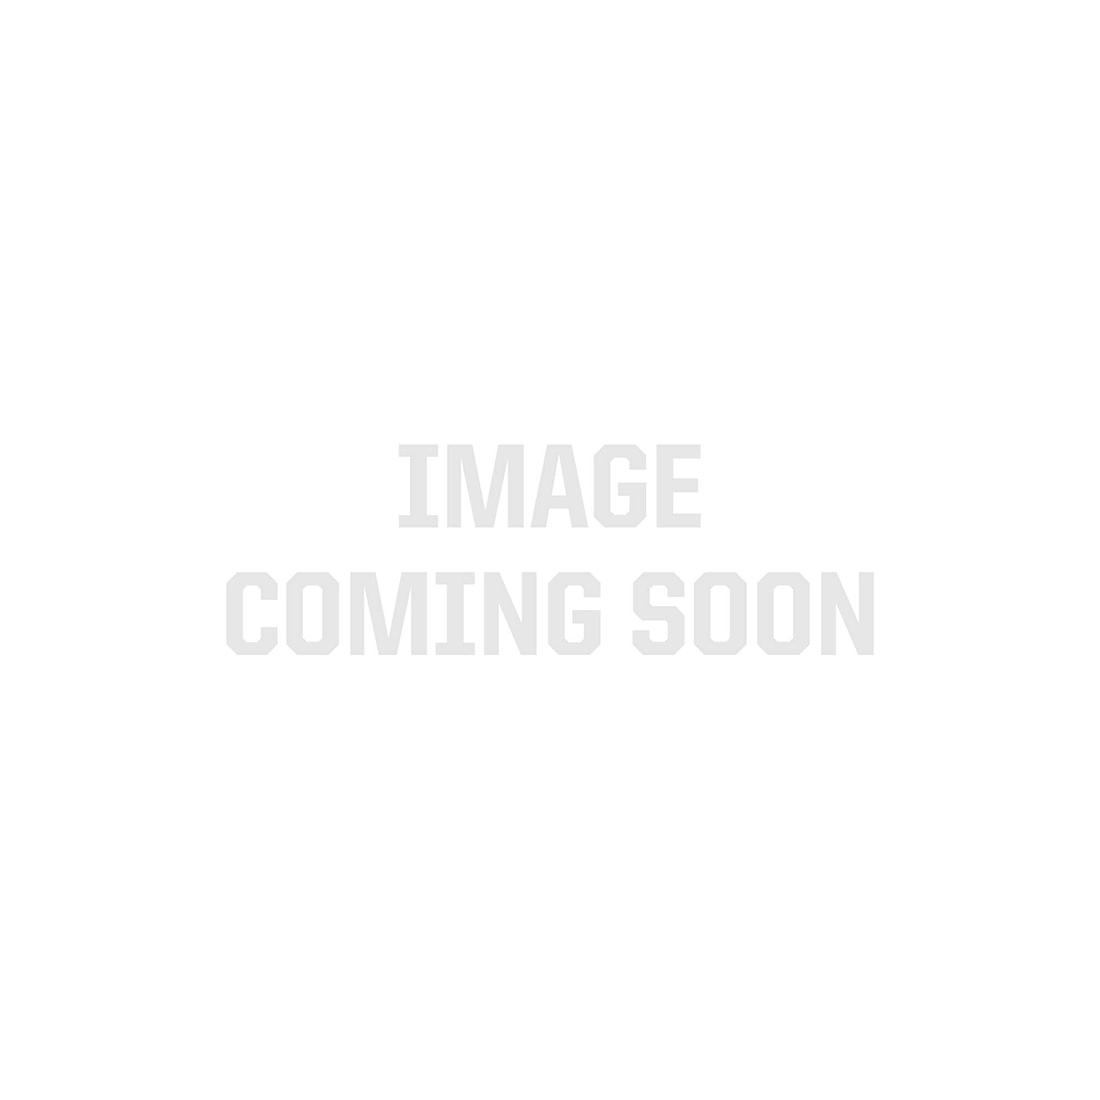 S14 Glass LED Christmas Light Bulb, E26 (Medium) Base, 0.7 watt (Warm White)